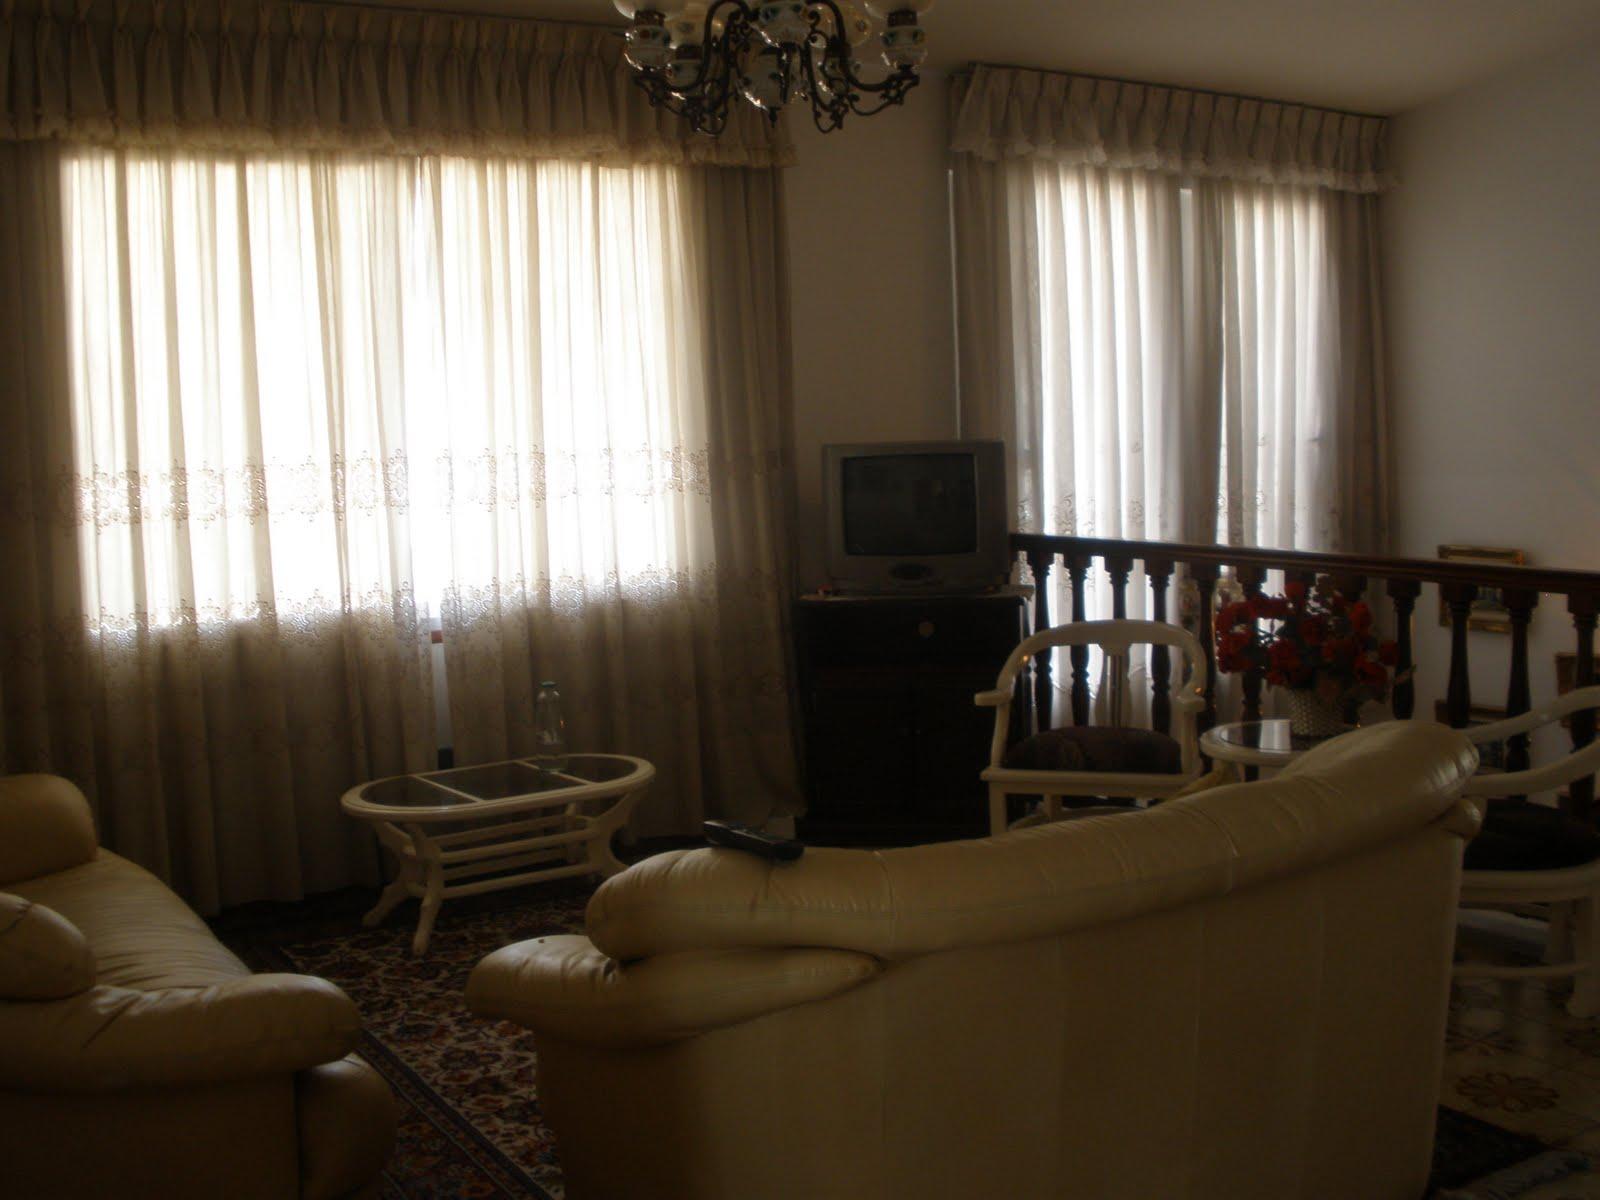 Club Hipico Pinterest: Vendo Hermosa Casa-Quinta En Club Hípico En 2.400.000 Bs